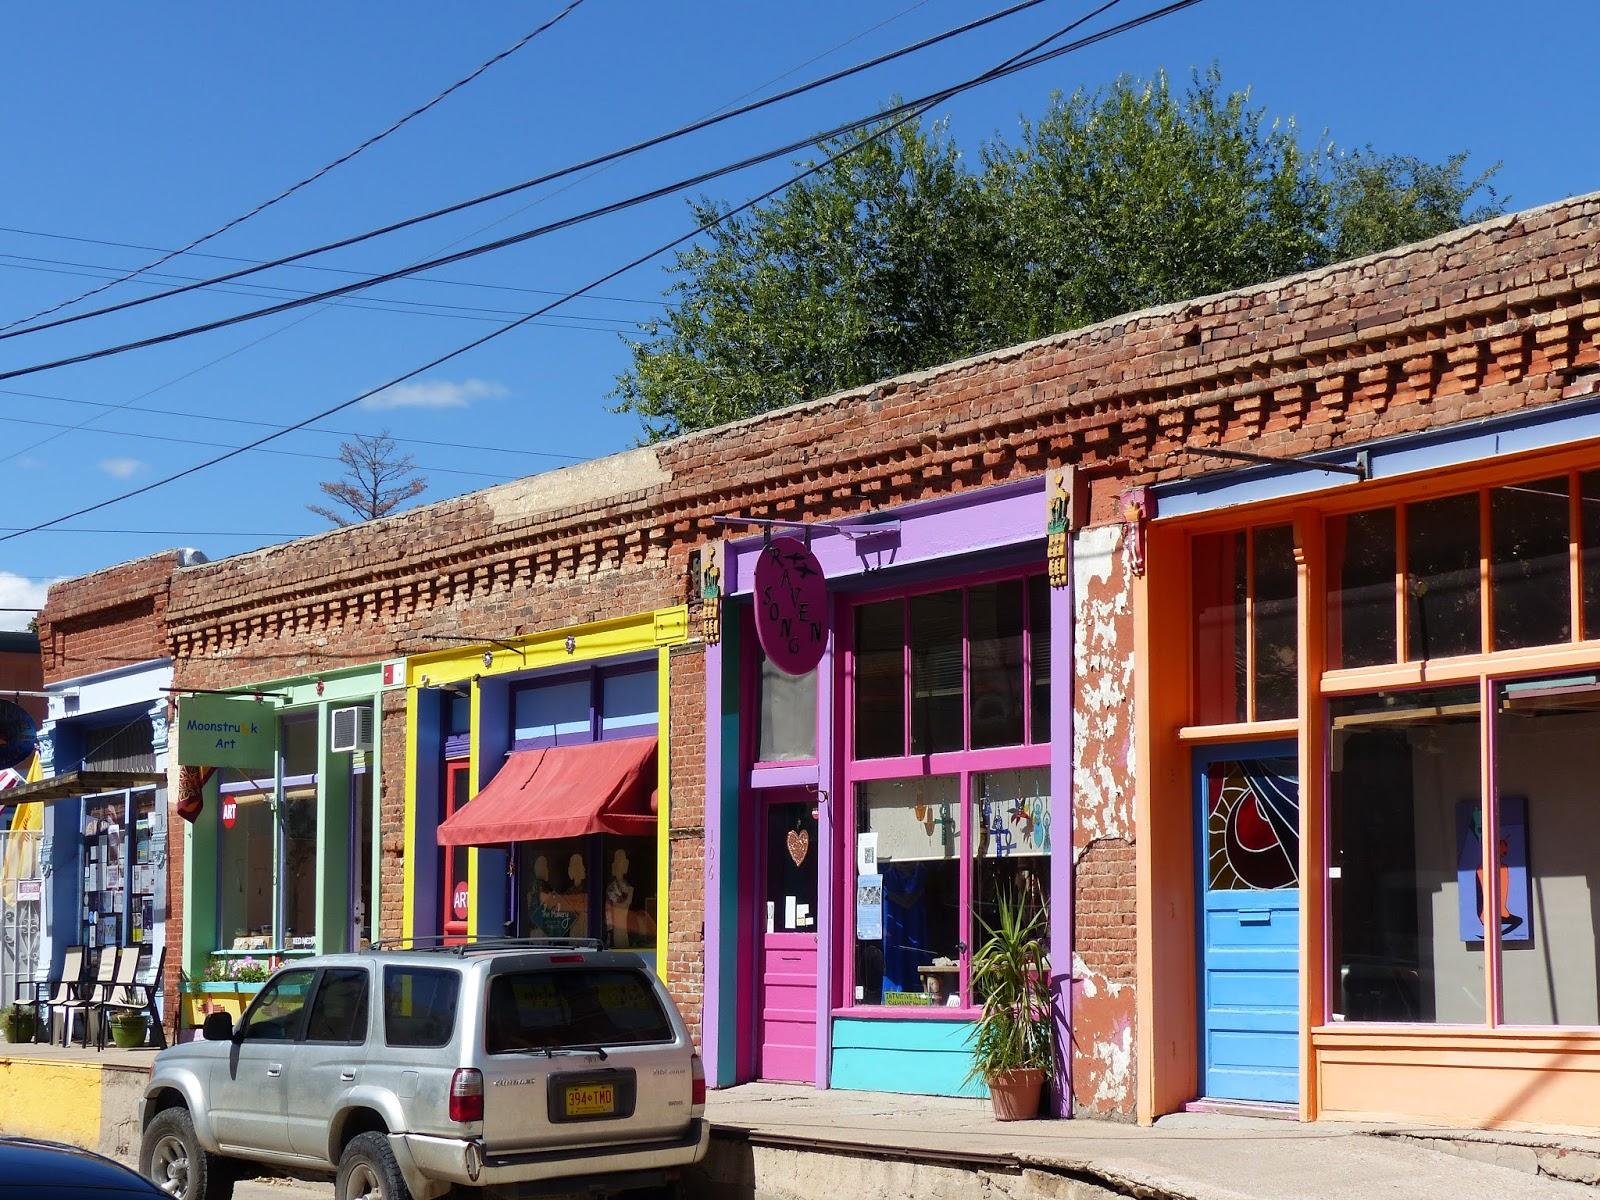 Ricardos Silver City NM Blog: About Silver City NM